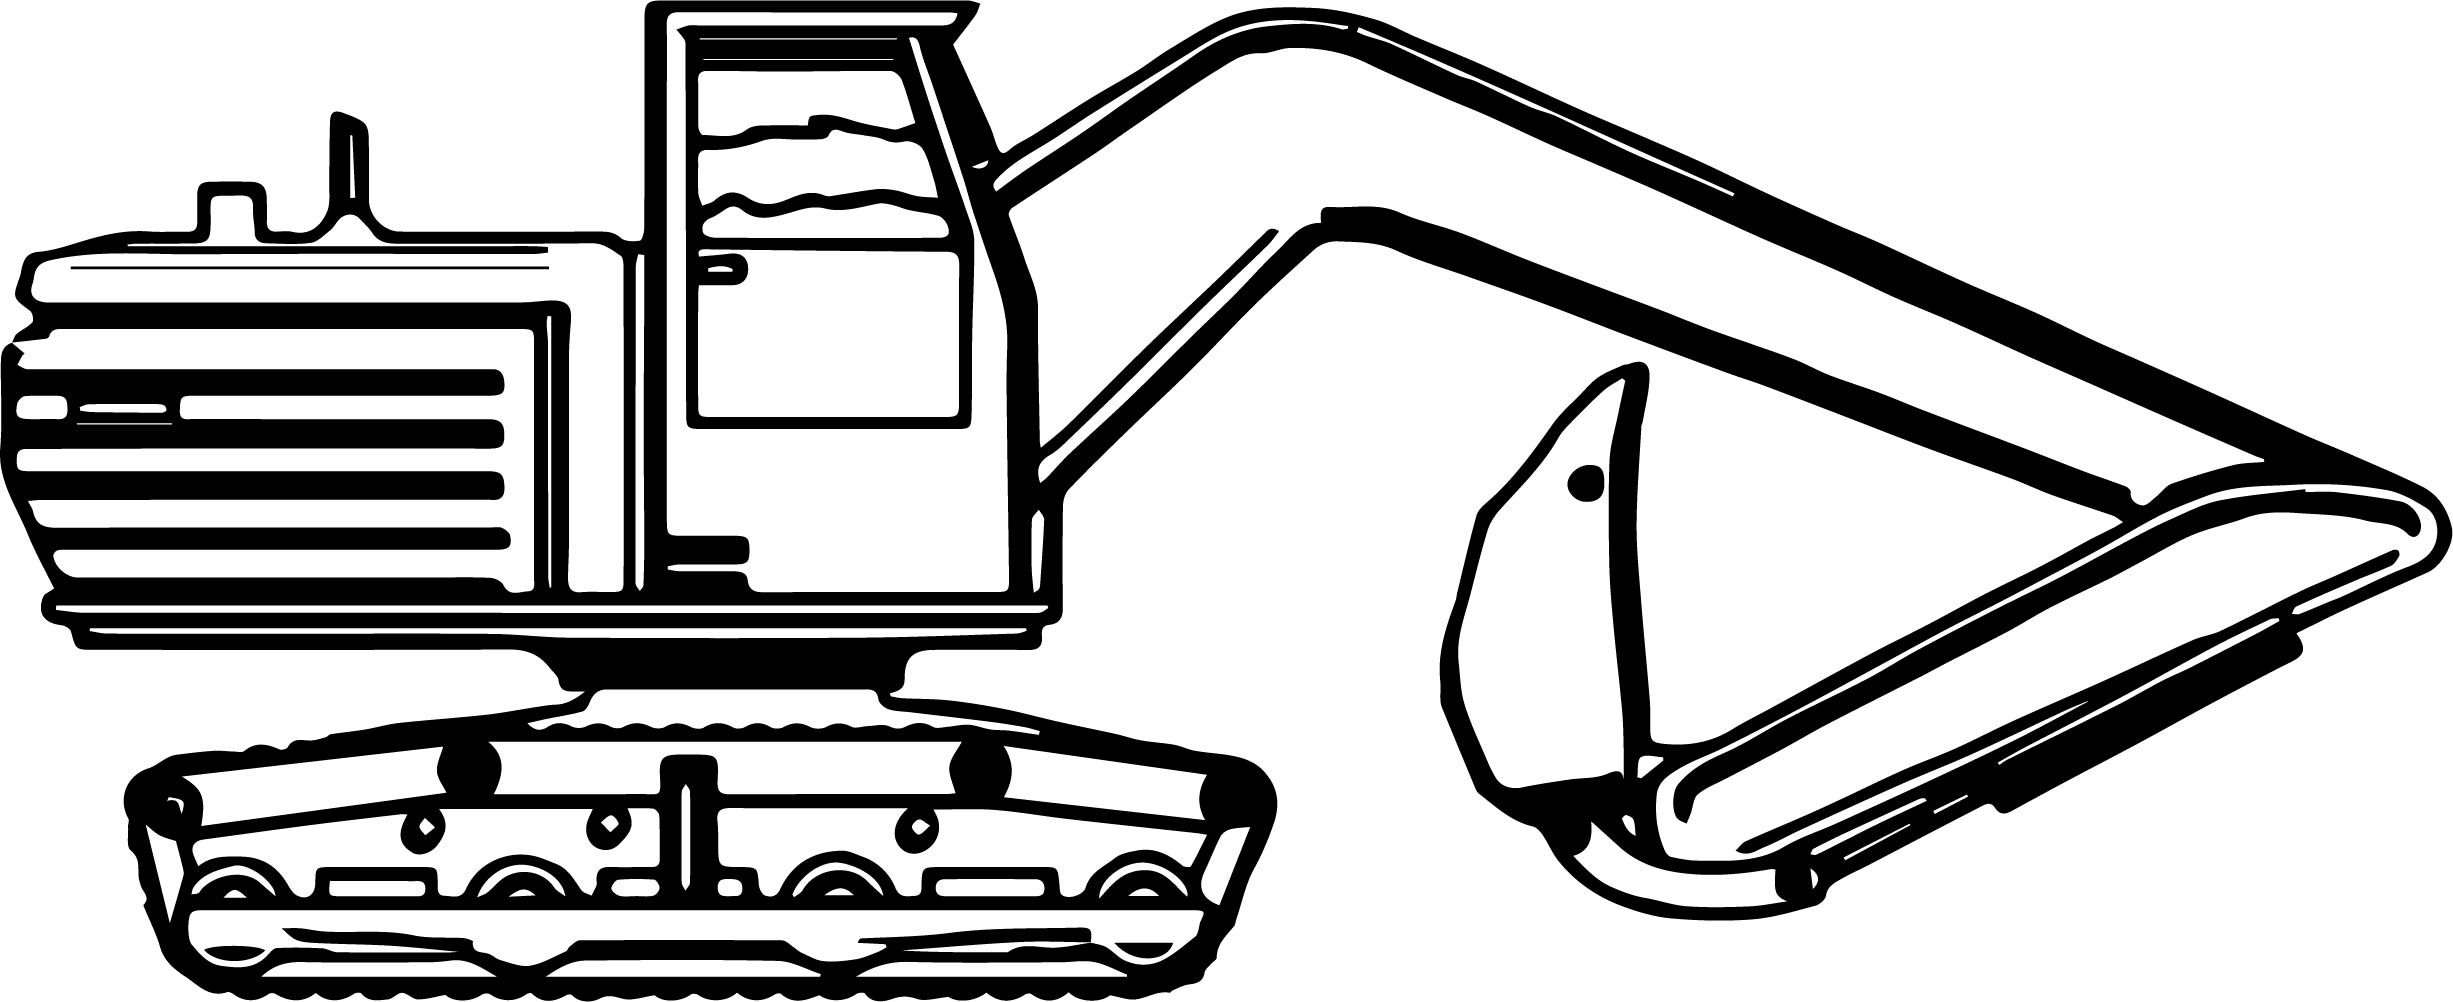 Big Side Bulldozer Coloring Page